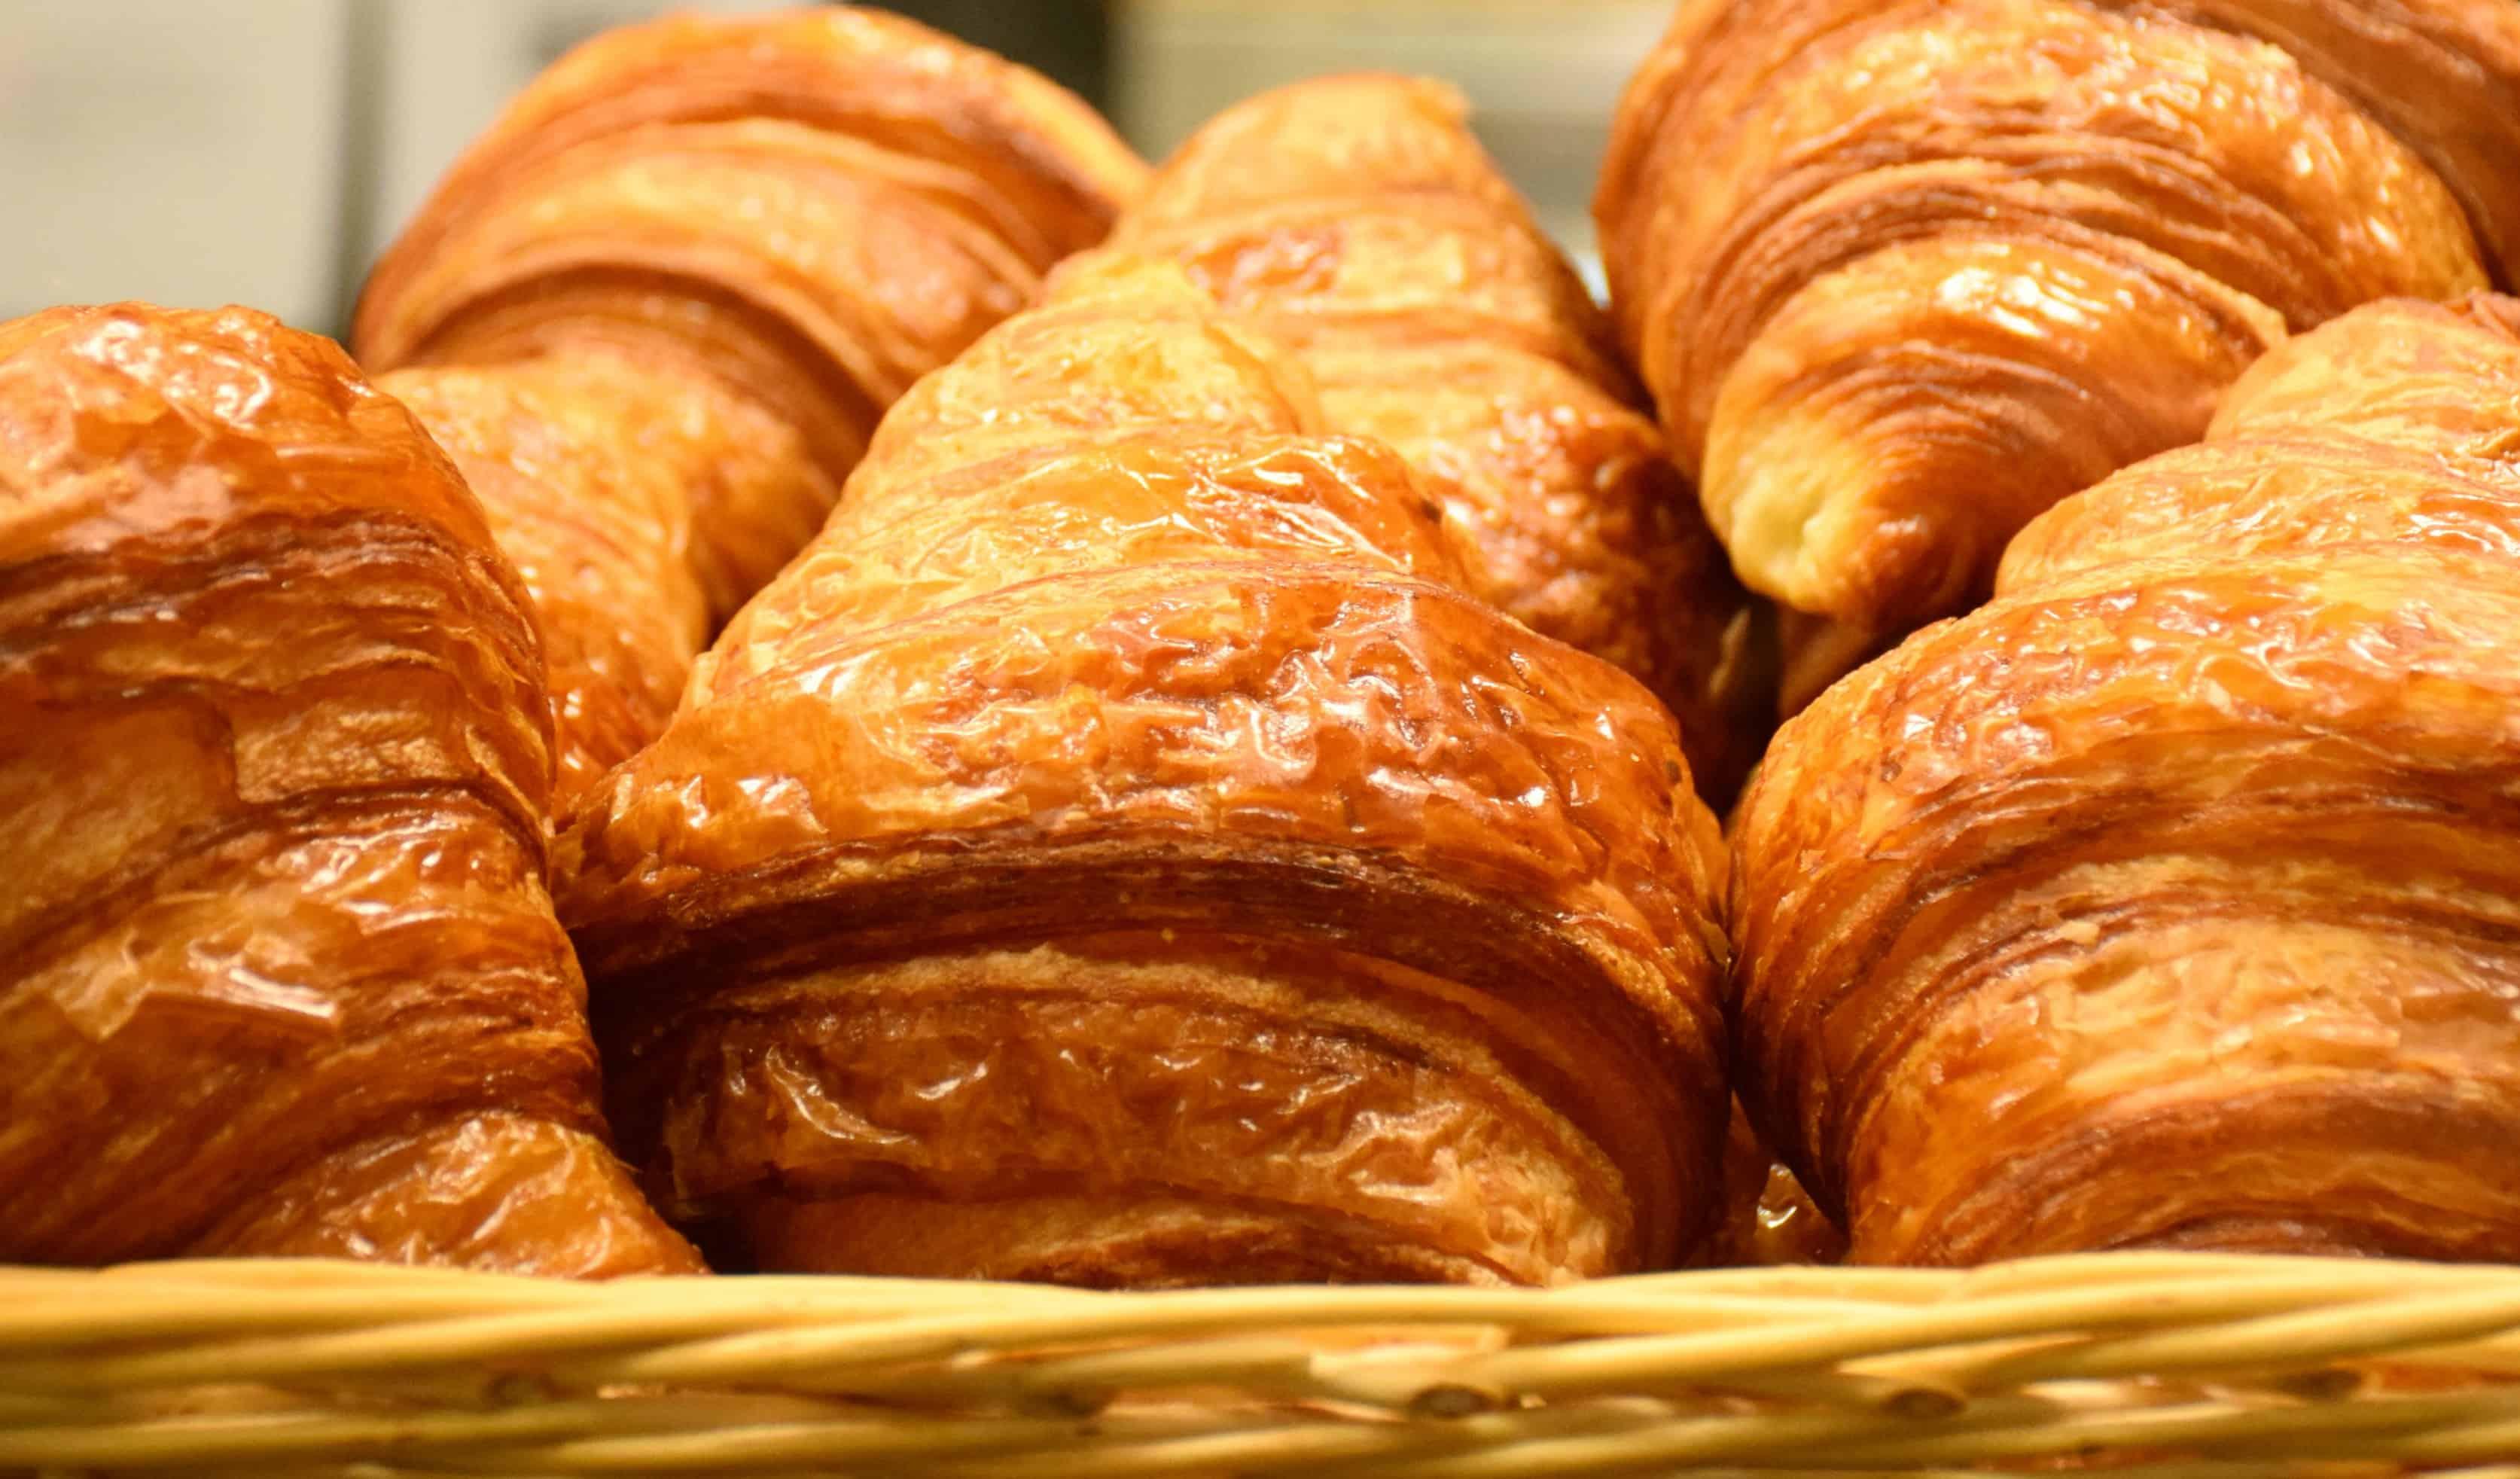 Croissant from Paillard